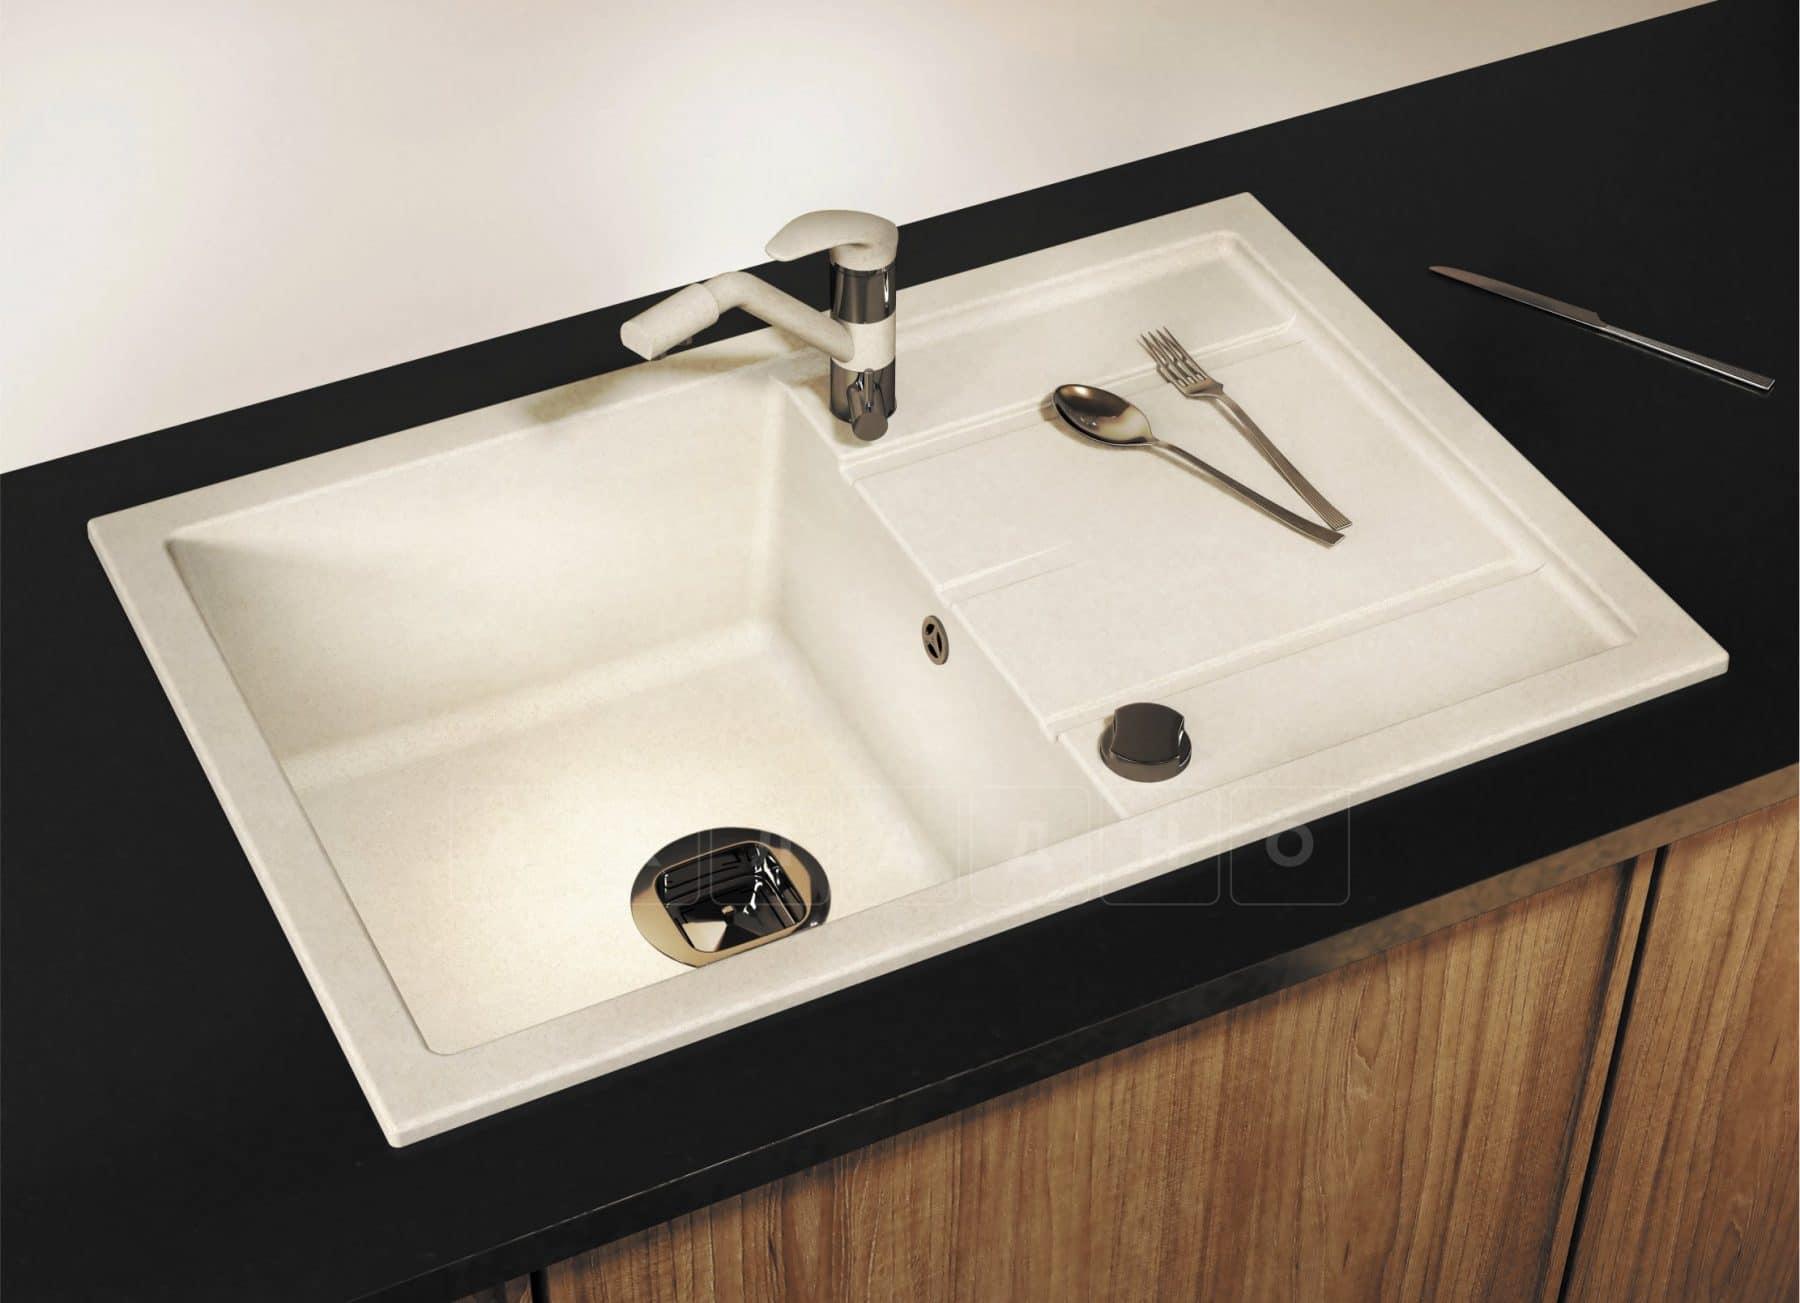 Кухонная мойка TOLERO R-112 кварцевая 76х51 см фото 10 | интернет-магазин Складно